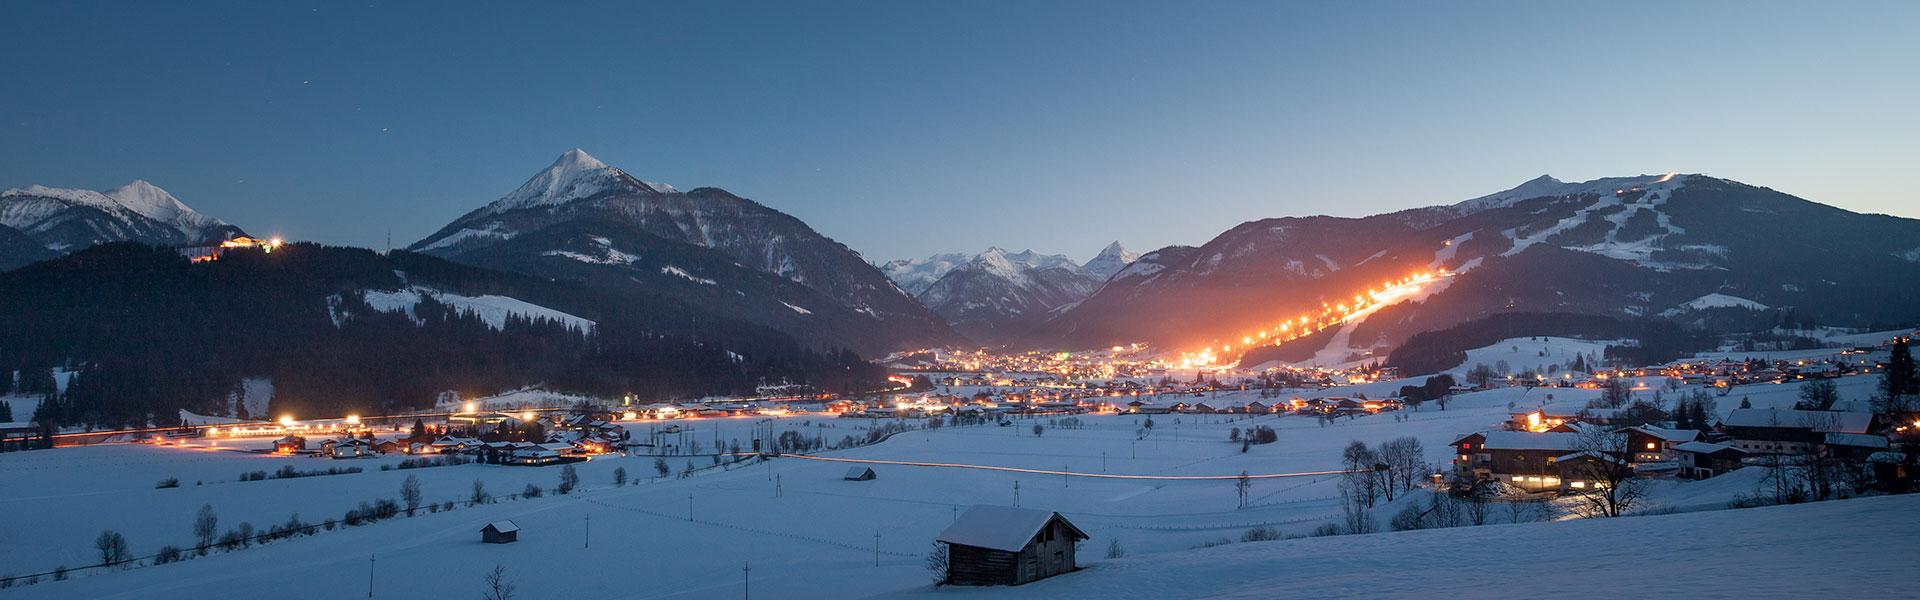 Winterurlaub & Skiurlaub in Flauchau